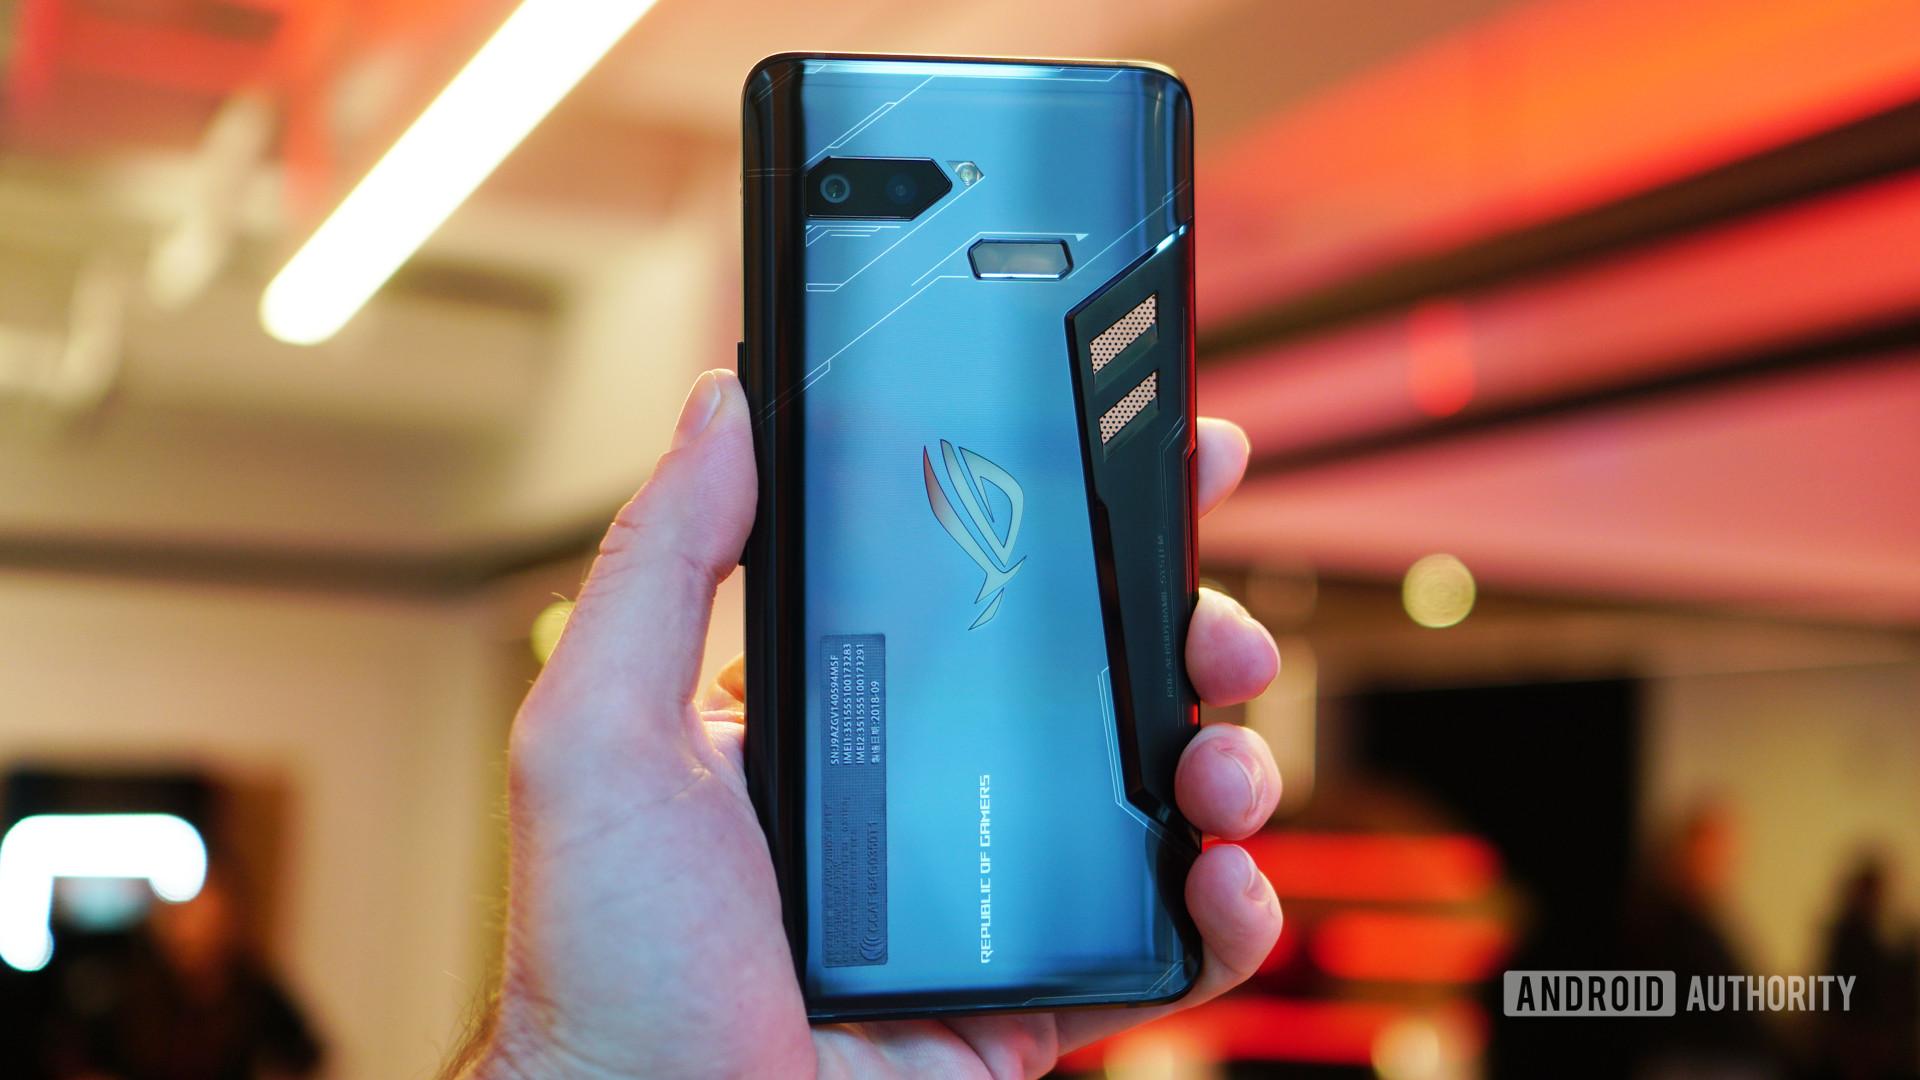 Asus ROG Phone in hand